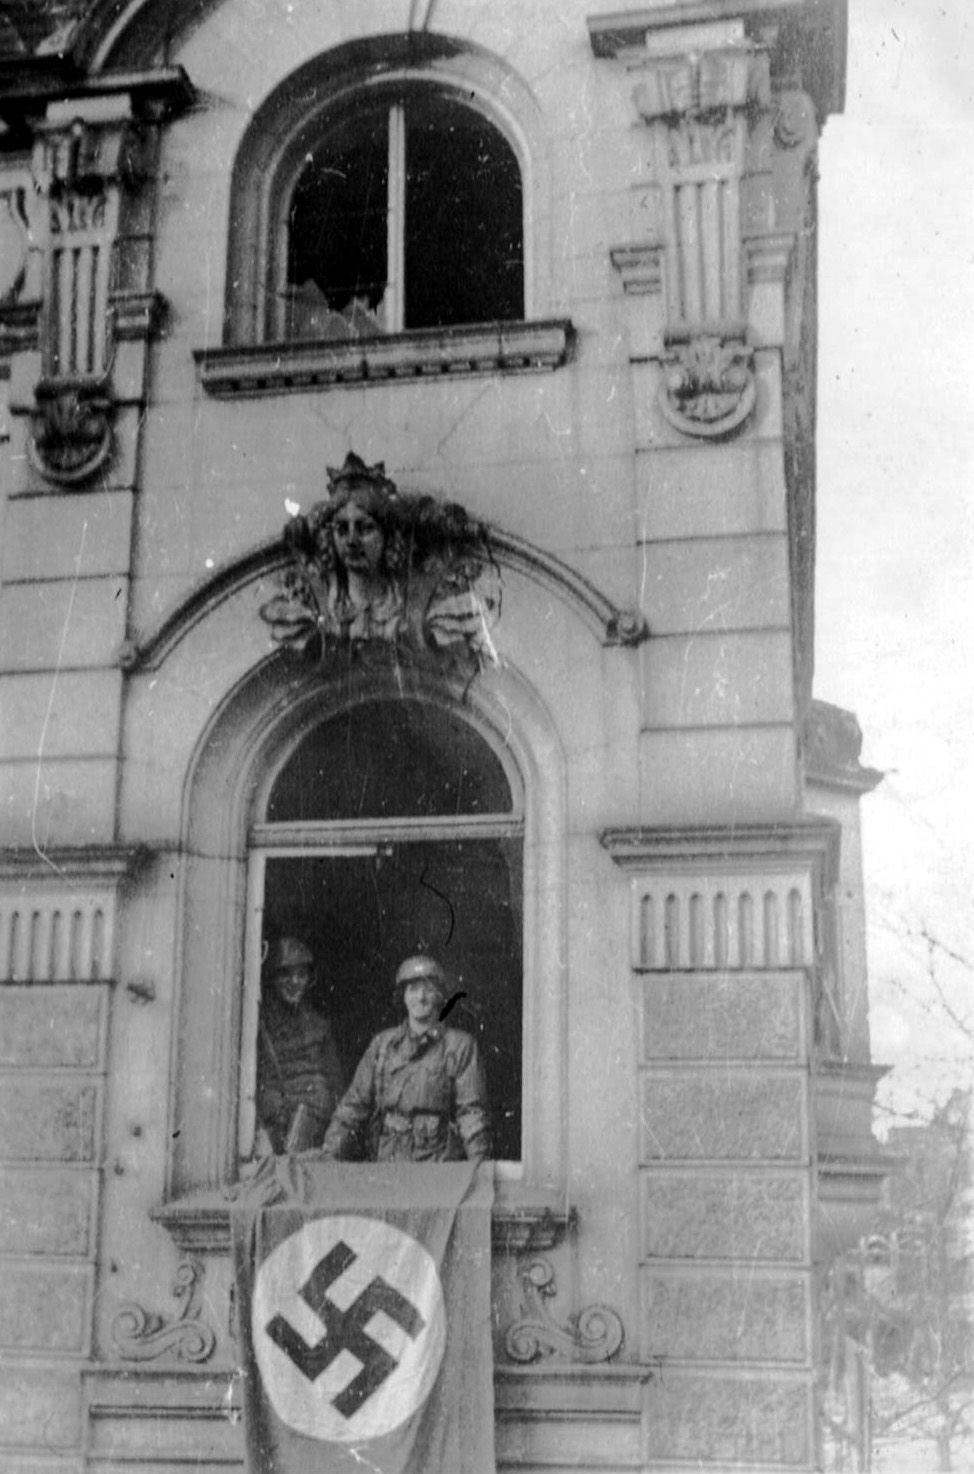 70th Infantry Division at Saarbrucken